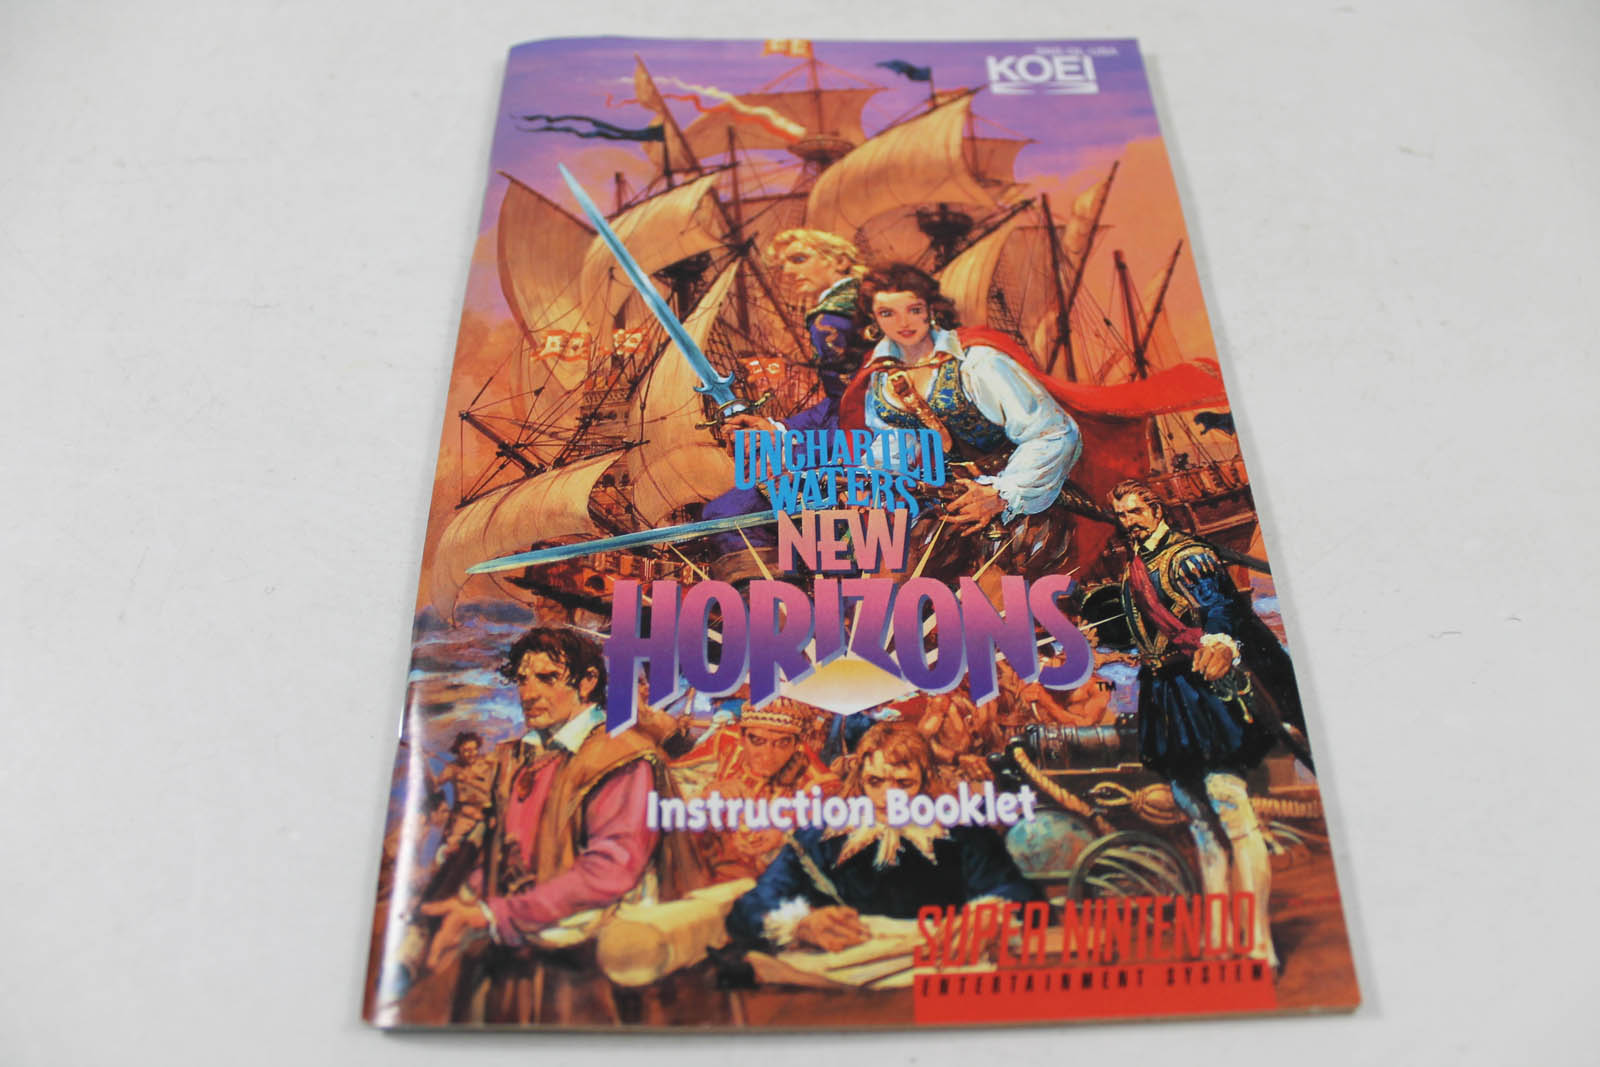 Manual - Uncharted Waters New Horizons Snes Super Nintendo